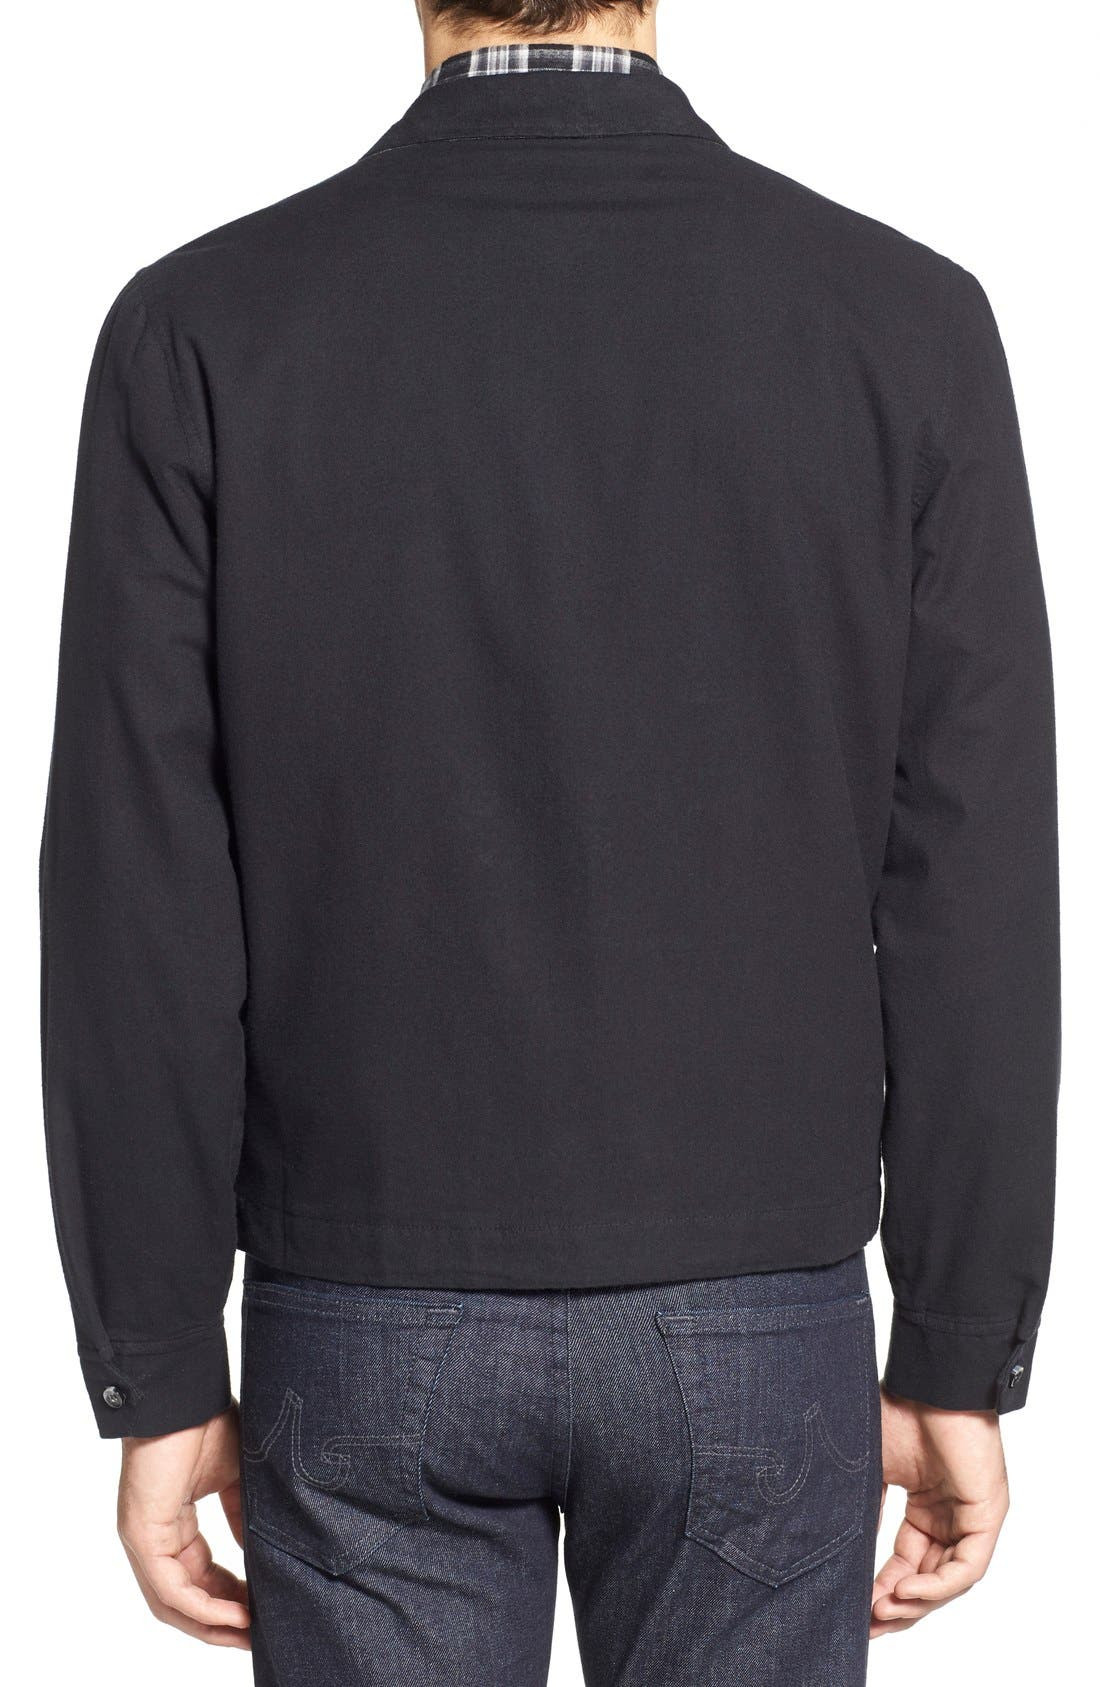 'Sedona' Zip Front Canvas Jacket,                             Alternate thumbnail 4, color,                             001